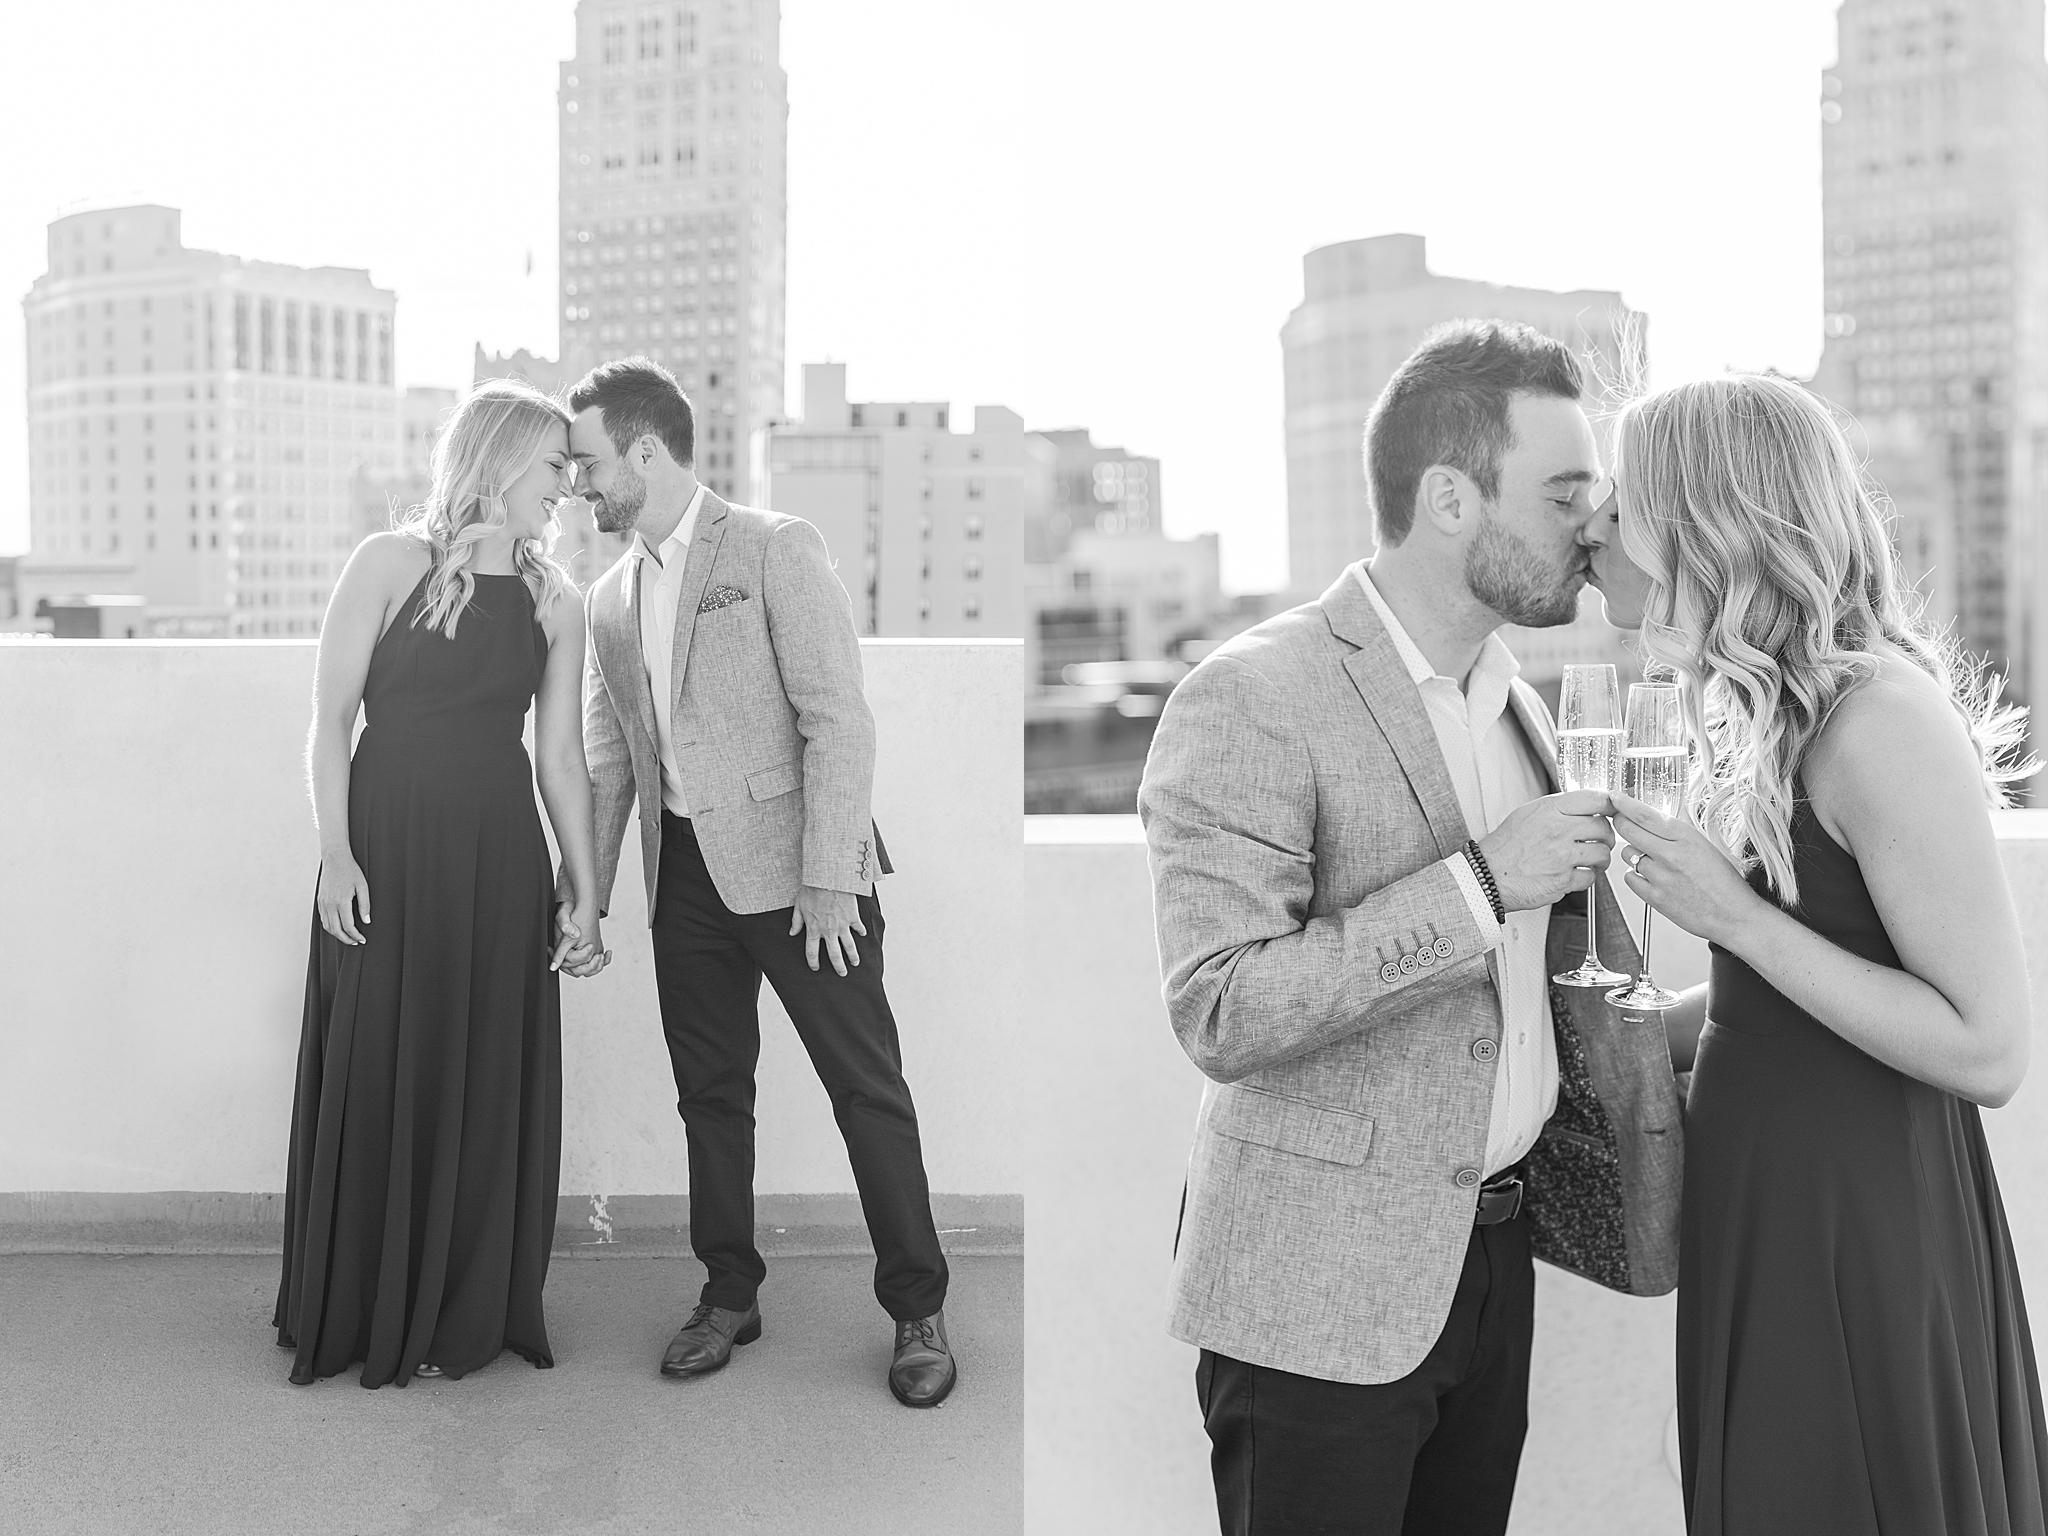 detroit-wedding-photographer-downtown-detroit-belle-isle-engagement-photos-sarah-eric-by-courtney-carolyn-photography_0014.jpg